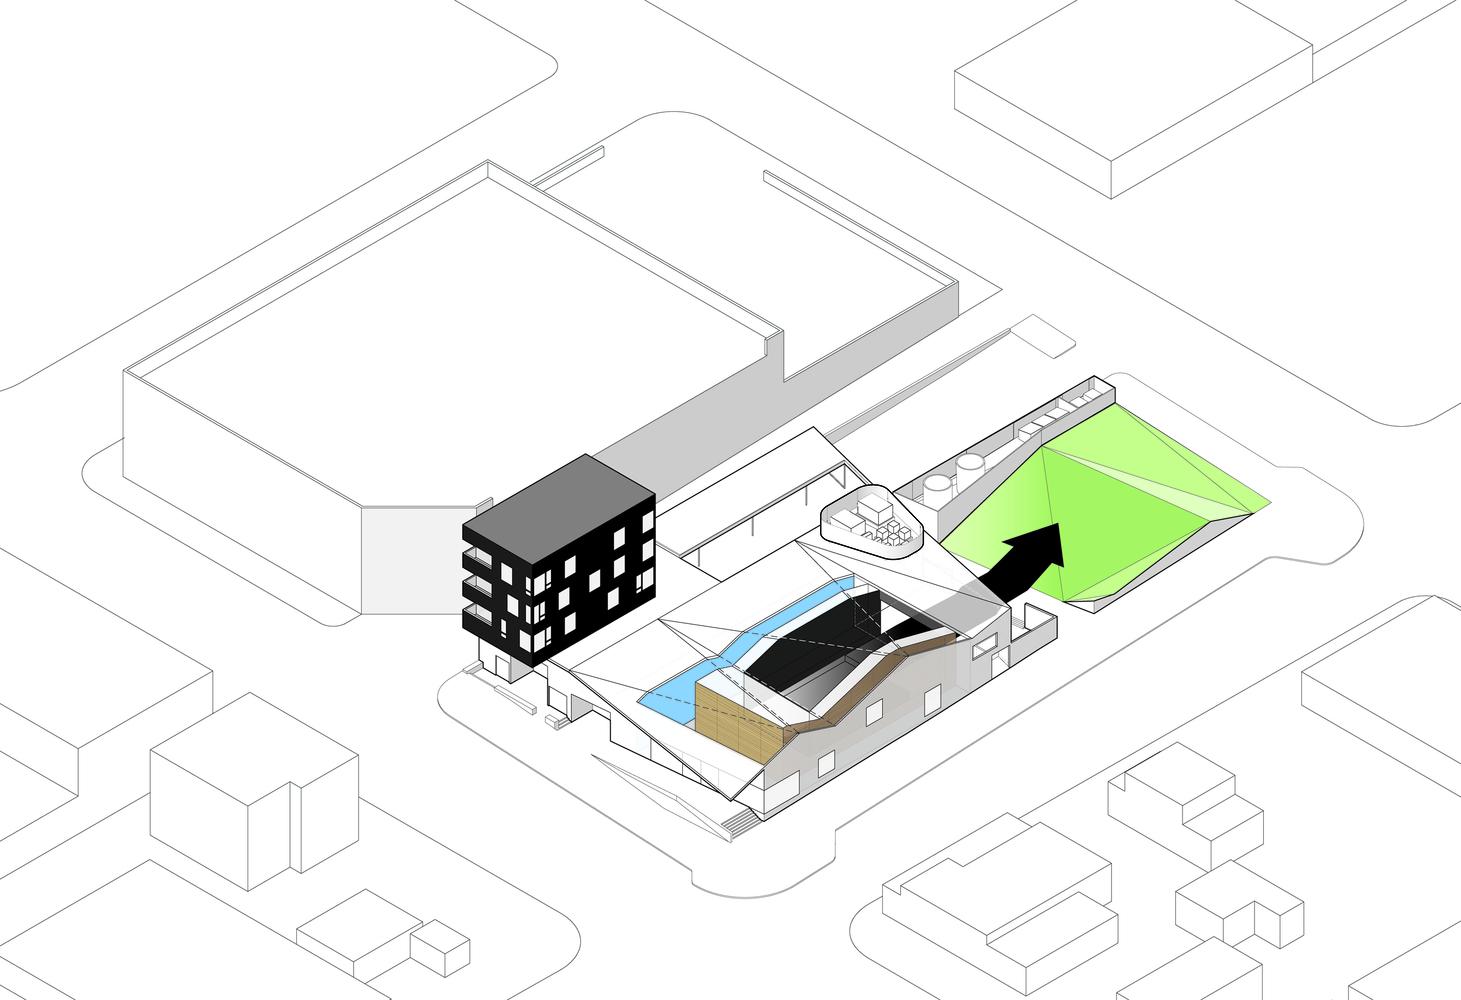 medium resolution of blue barn theatre boxcar 10 min day diagram